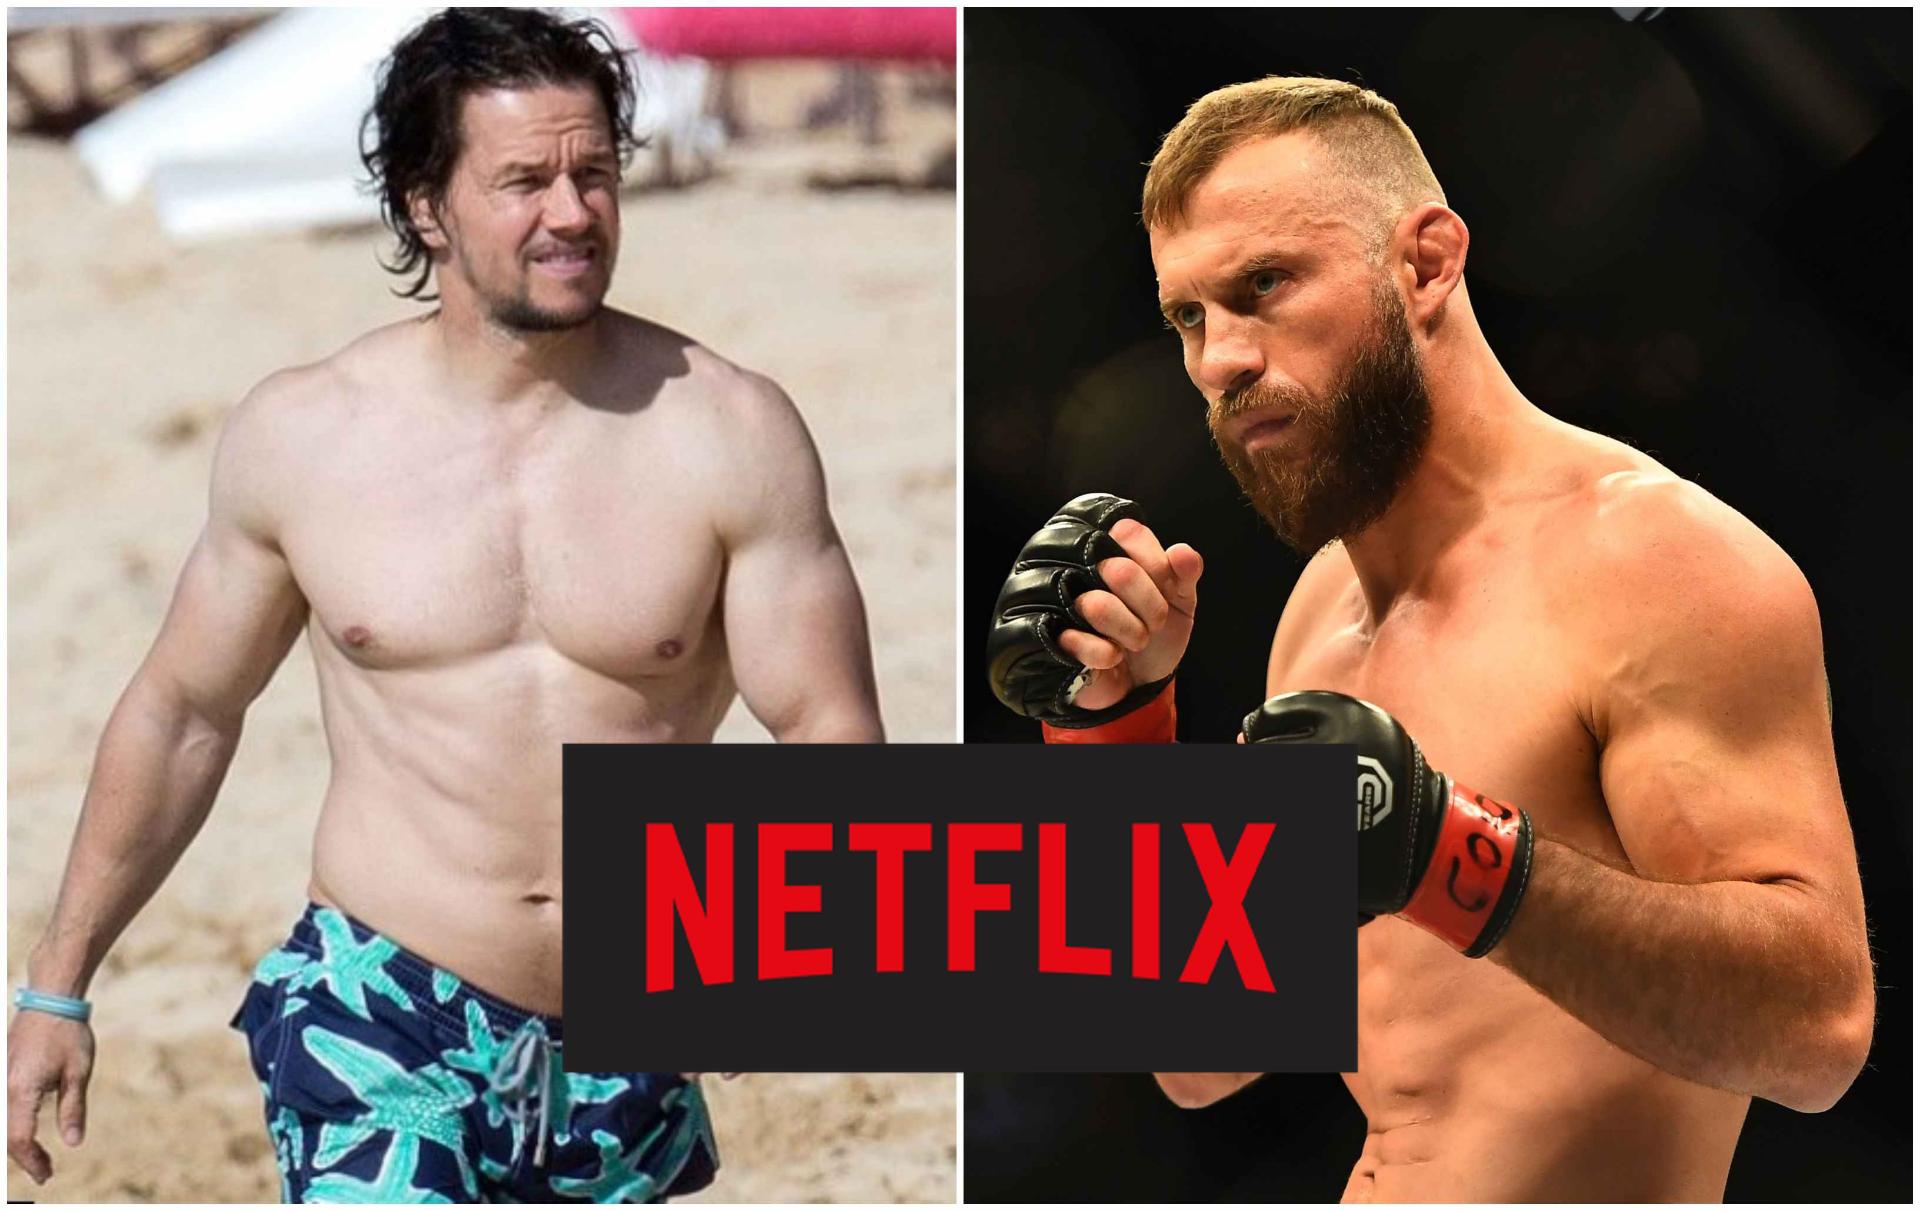 Cowboy starring in Netflix special alongside Mark Wahlberg - Mark